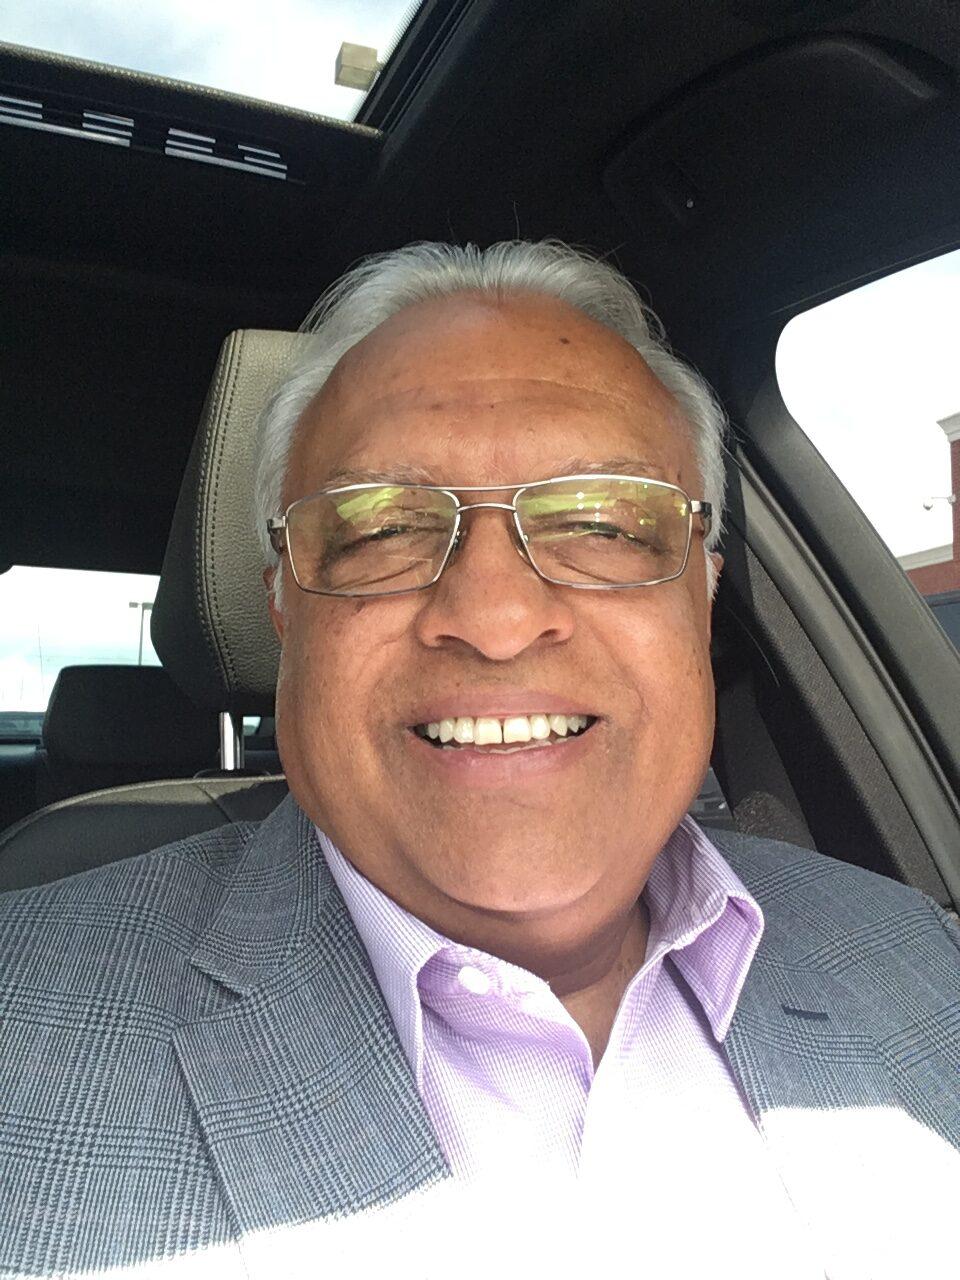 SSintel: SOhail Saeed, ON, Canada